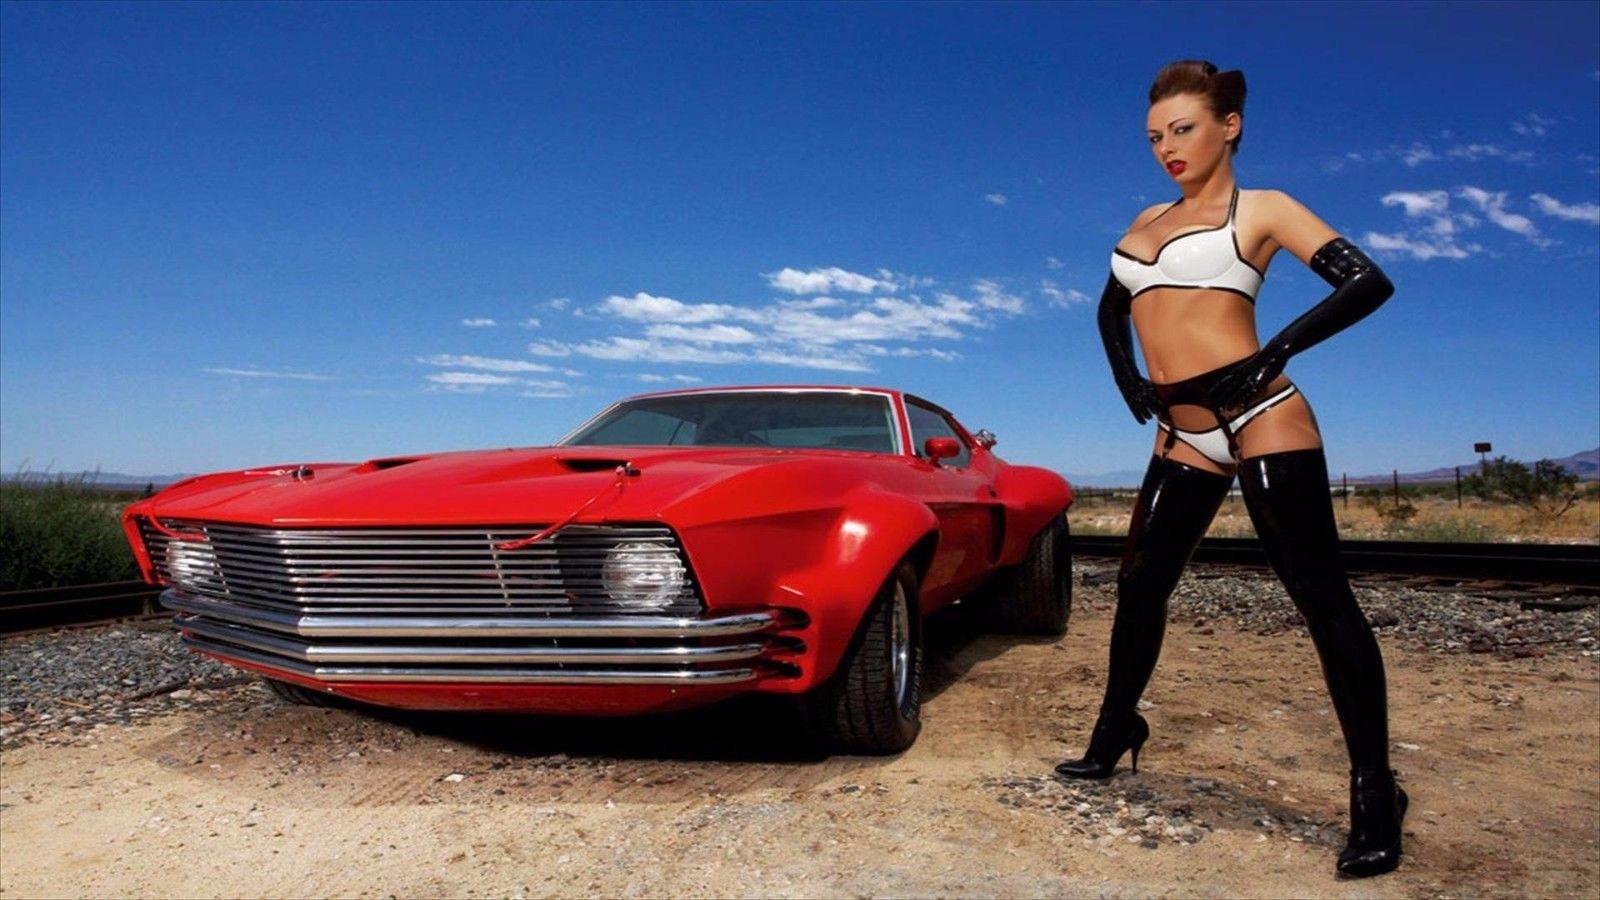 127318 Hot Car Decor WALL PRINT POSTER AU